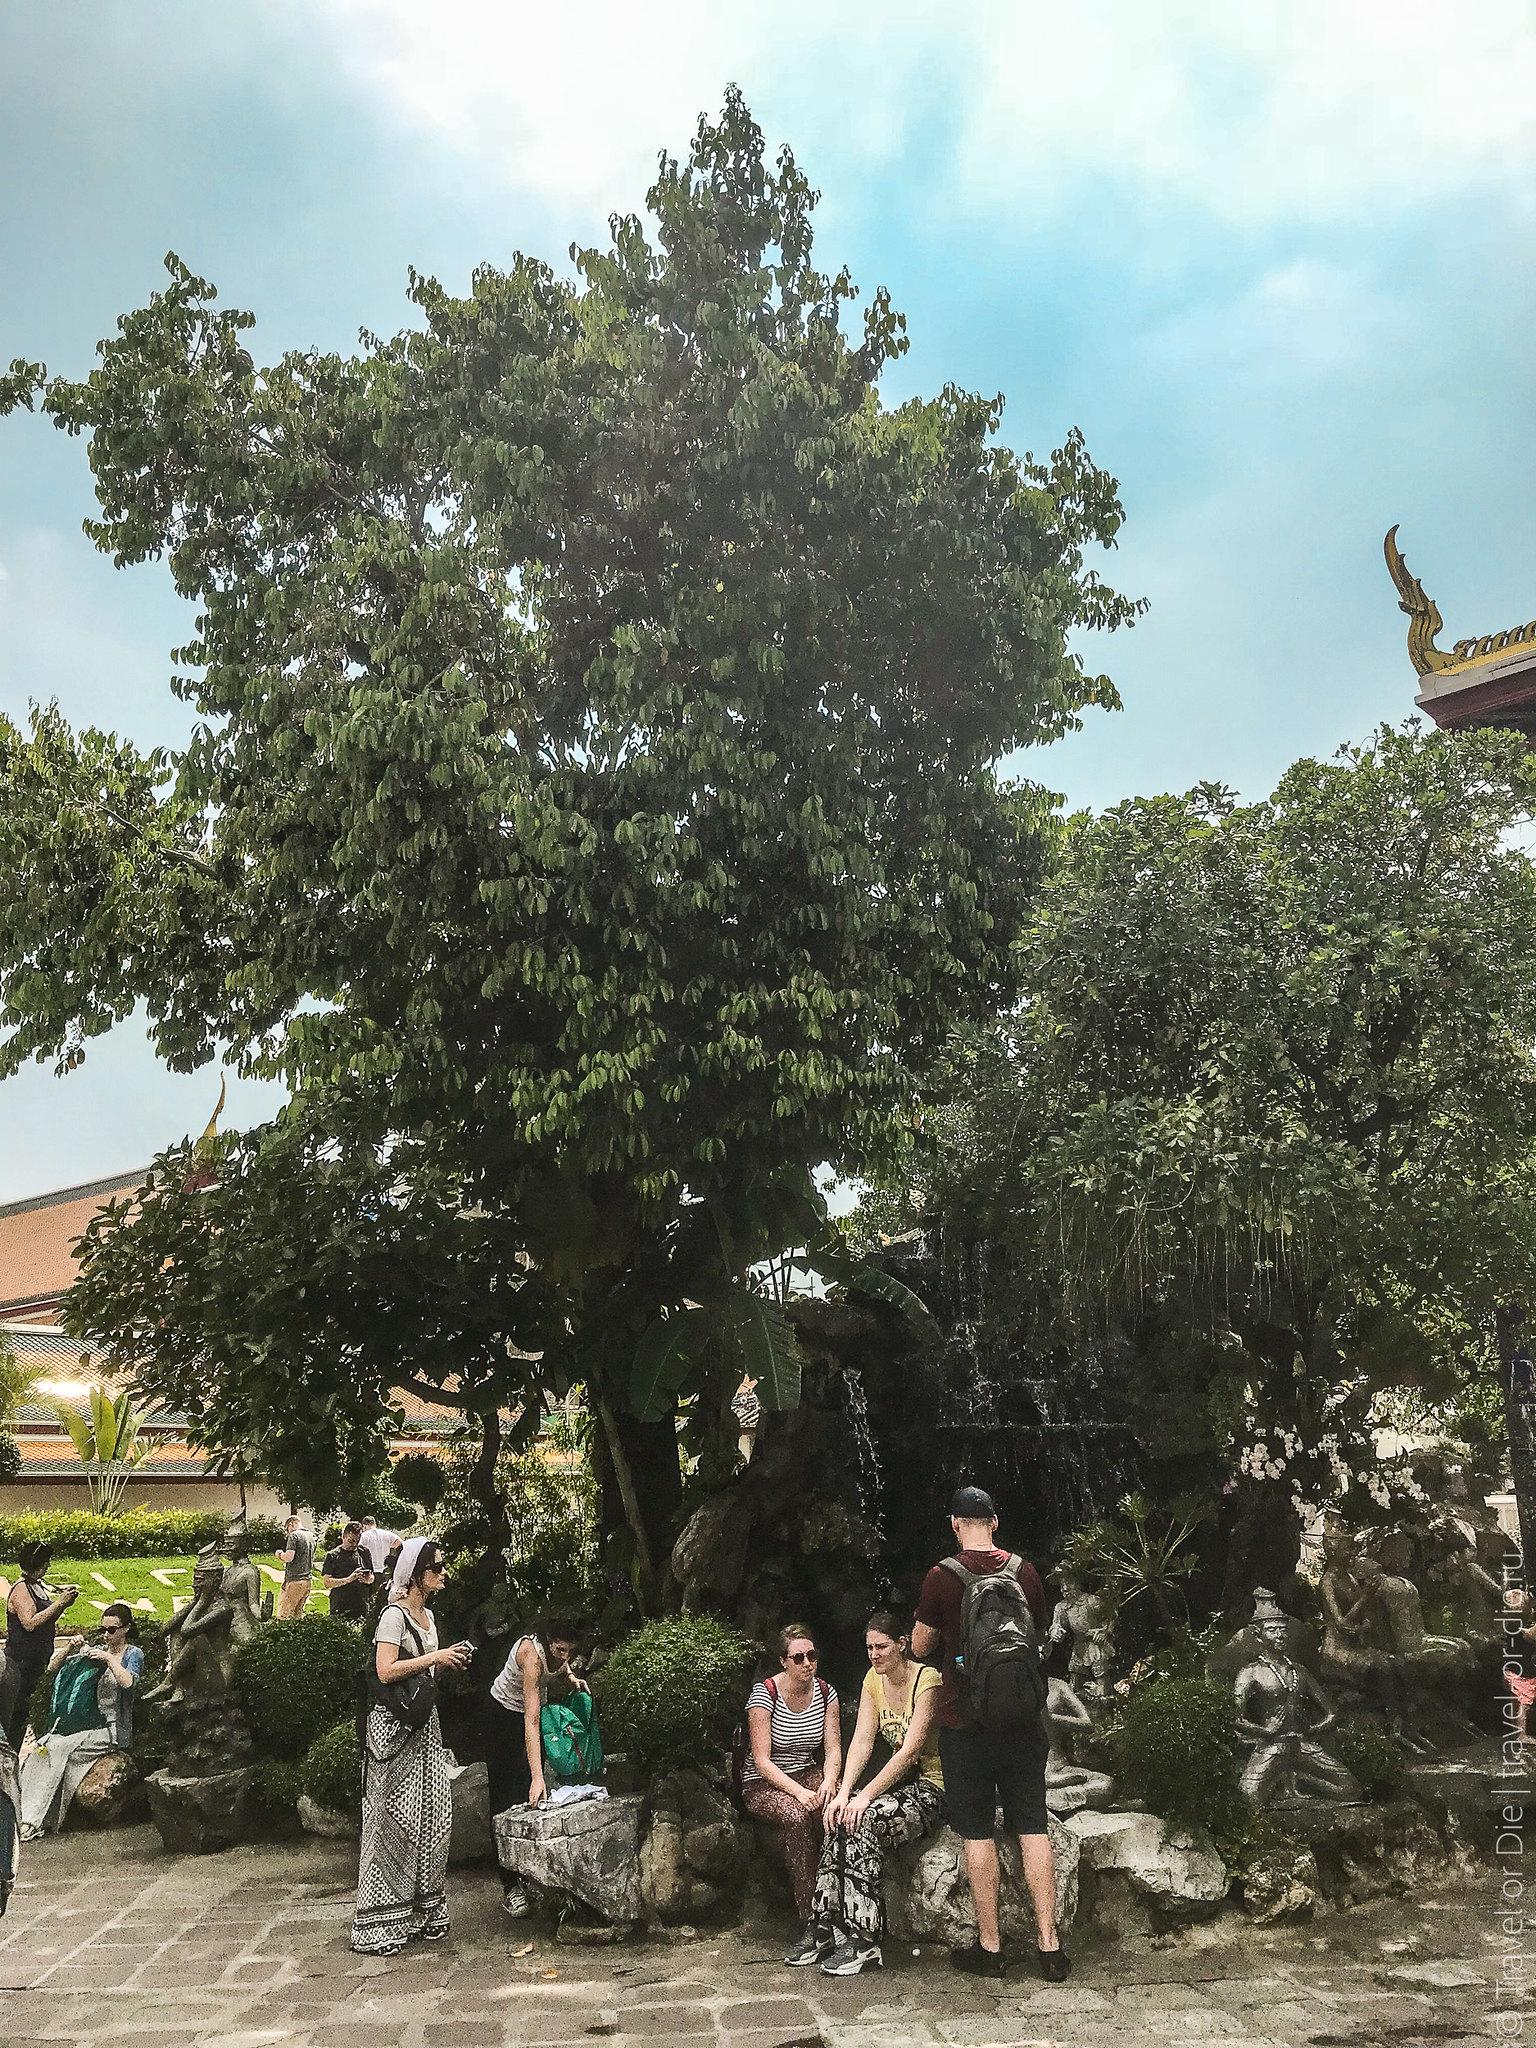 Wat-Pho-Bangkok-Храм-Лежащего-Будды-9124